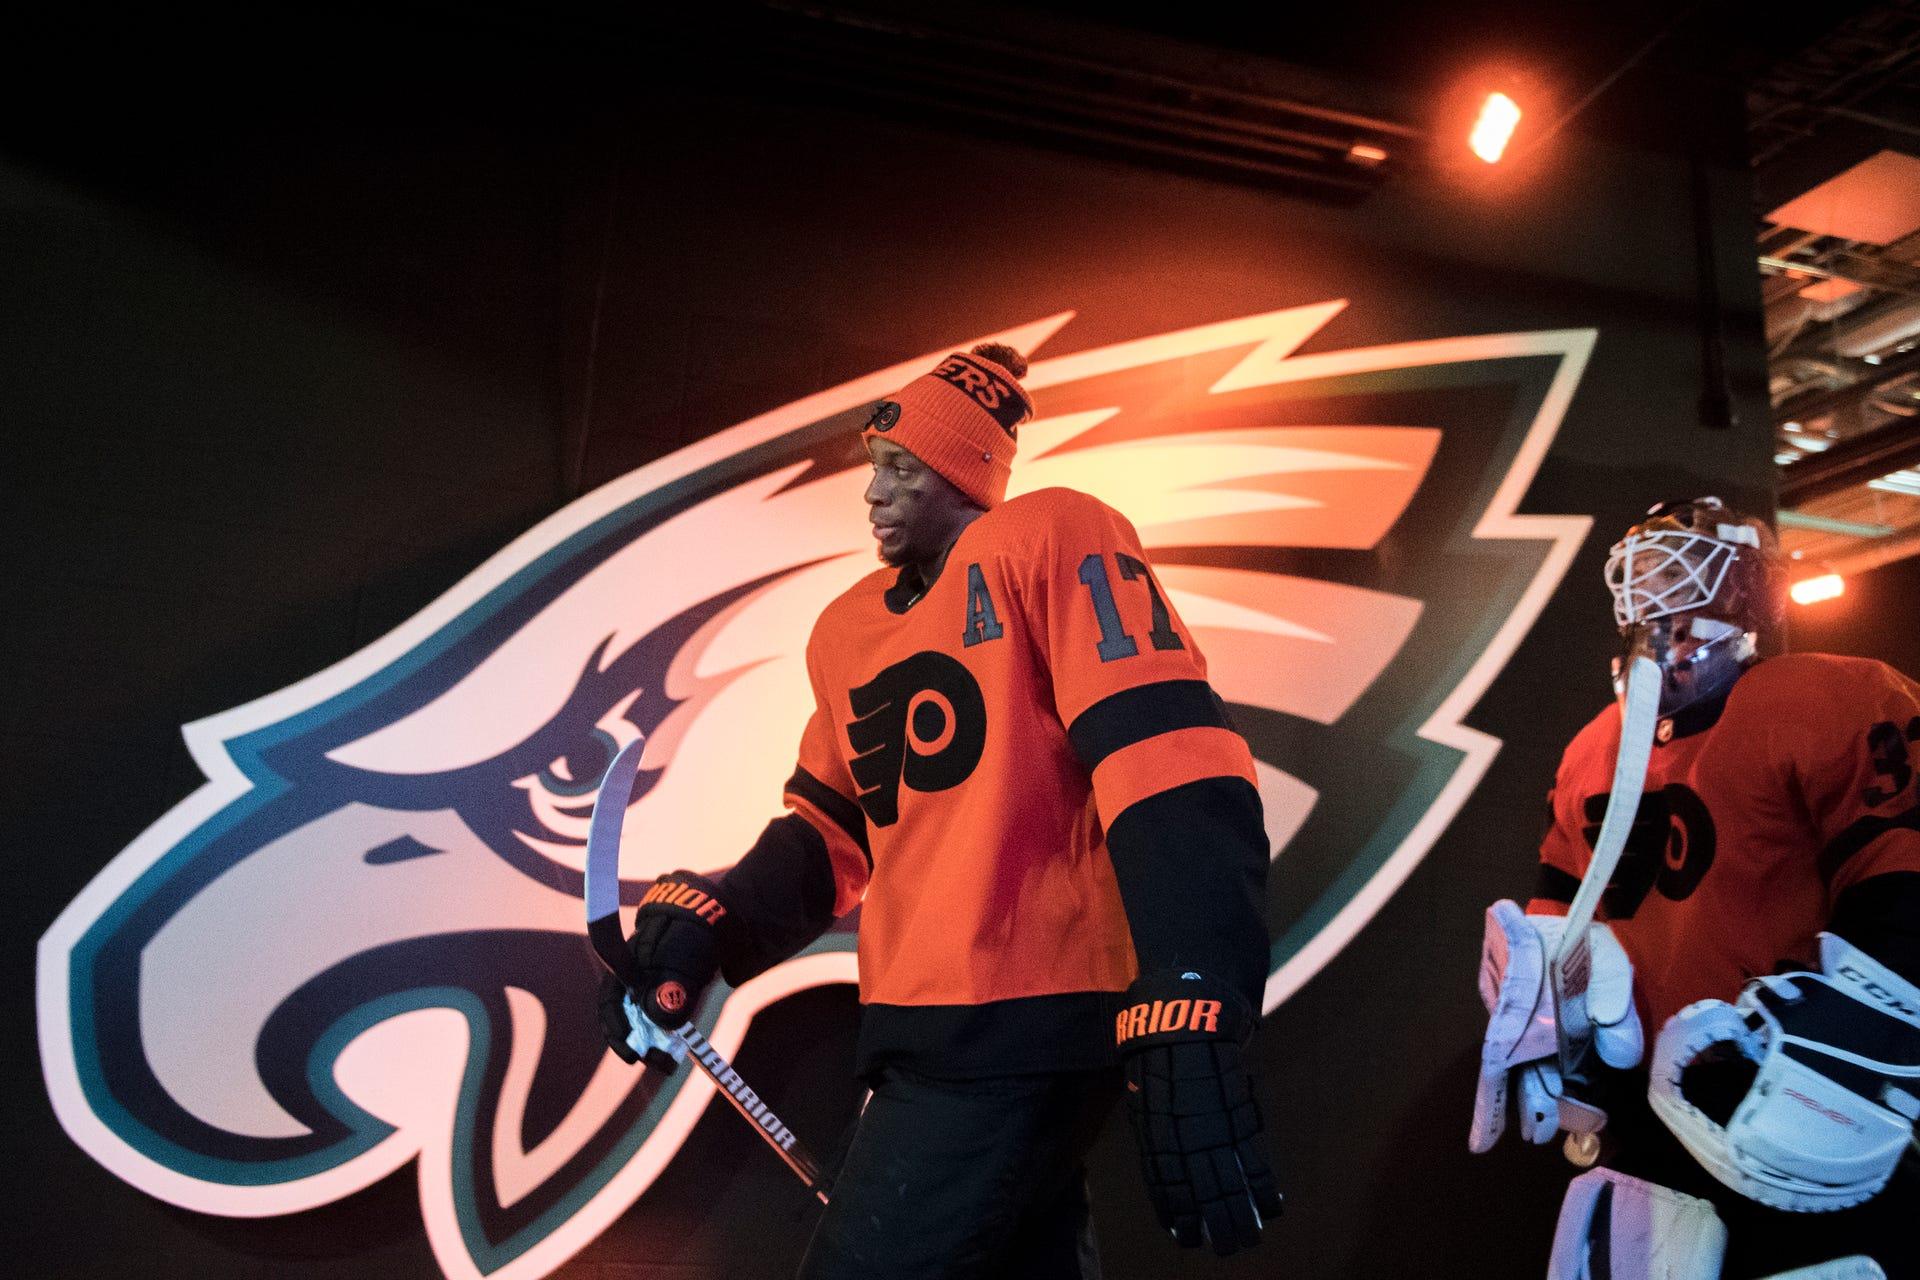 finest selection 85091 229d7 Photos: Stadium Series: Flyers defeat Penguins 4-3 in OT